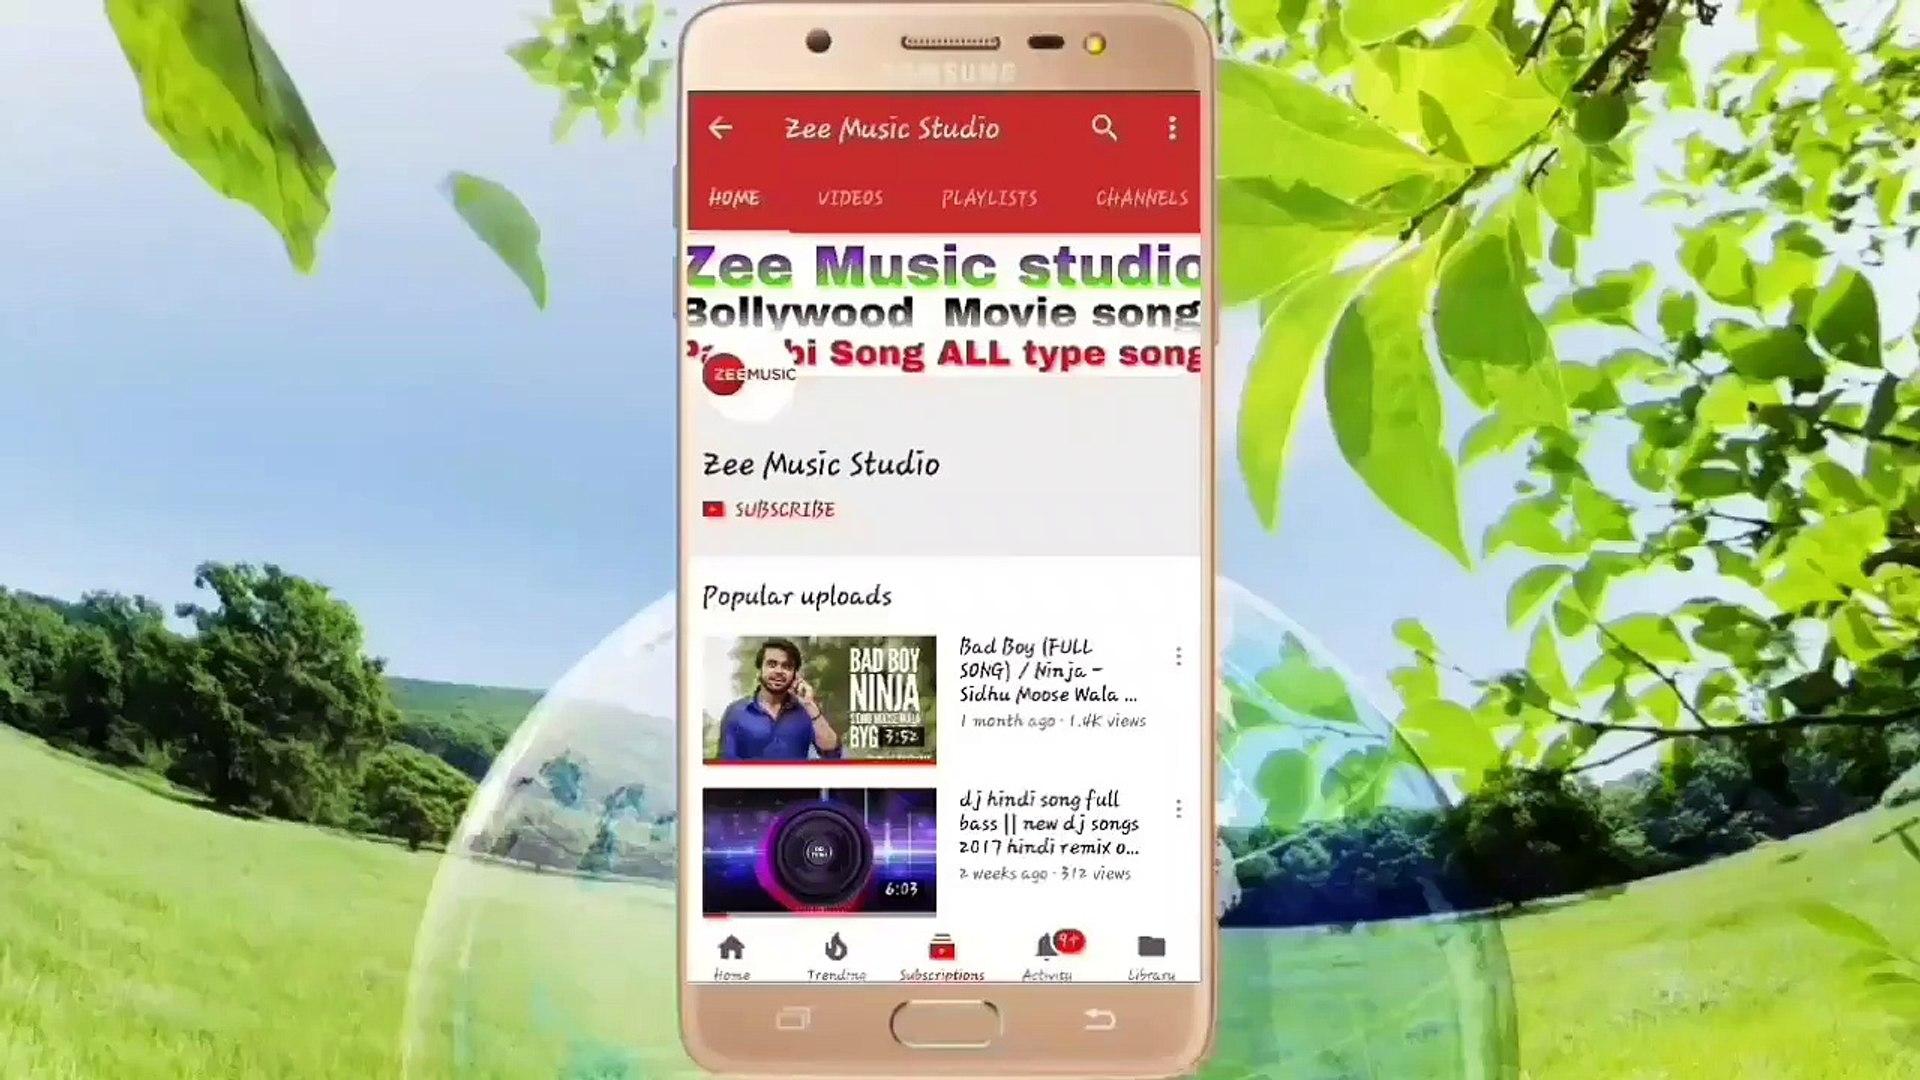 dj music_ remix songs__dj rimix hindi song __ song dj mix __ new dj song  mp3 HD